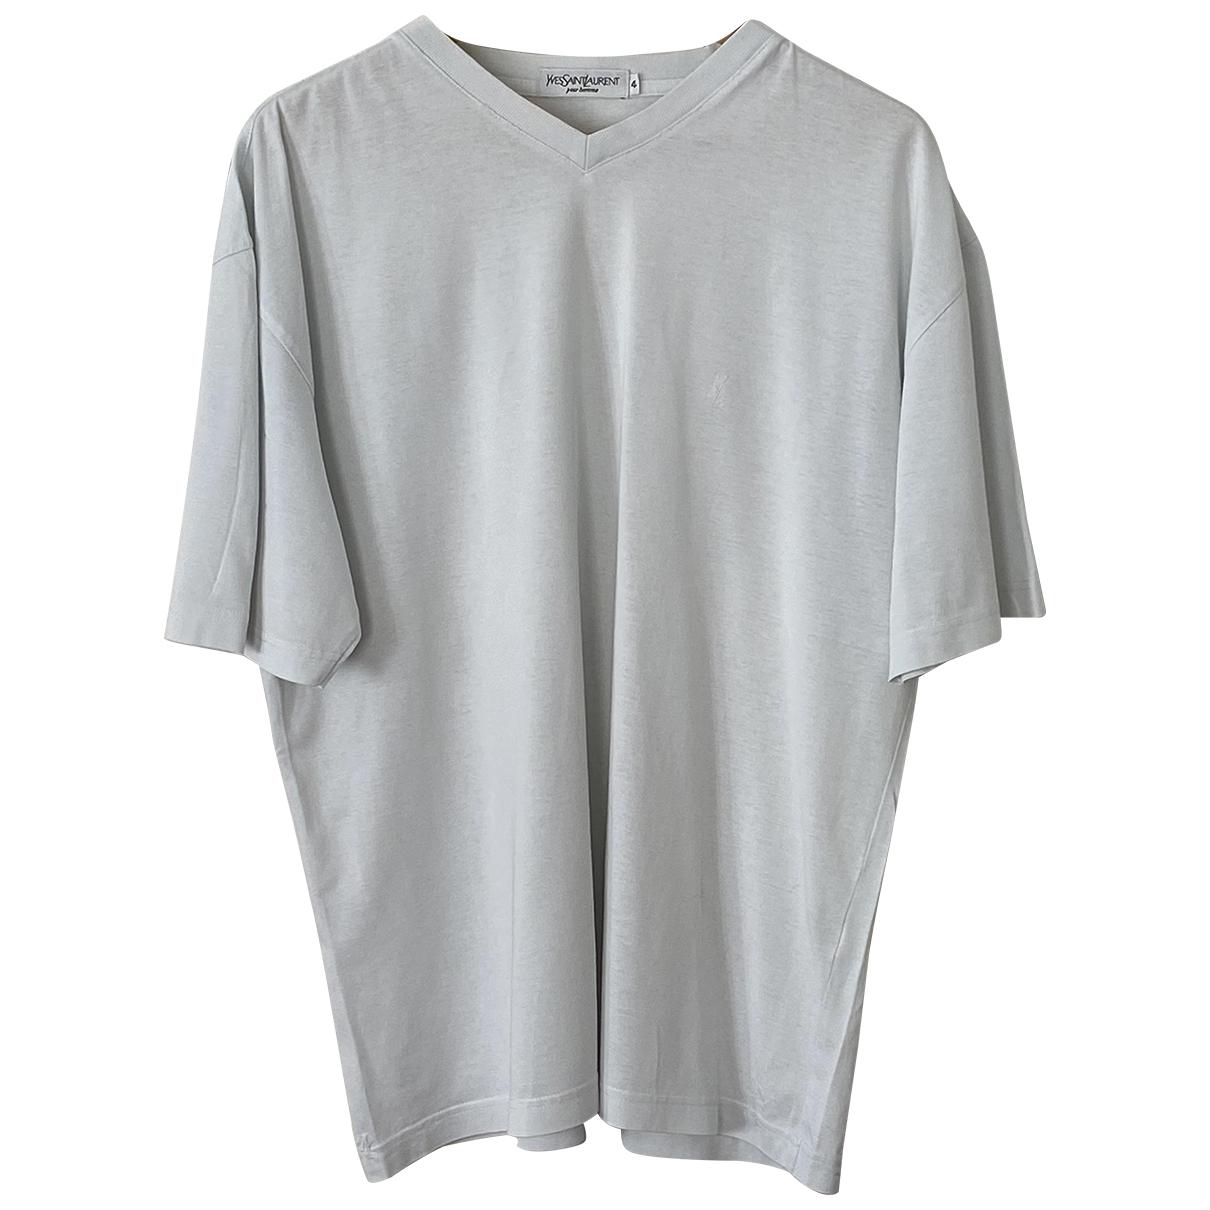 Yves Saint Laurent N White Cotton T-shirts for Men 4 0 - 6